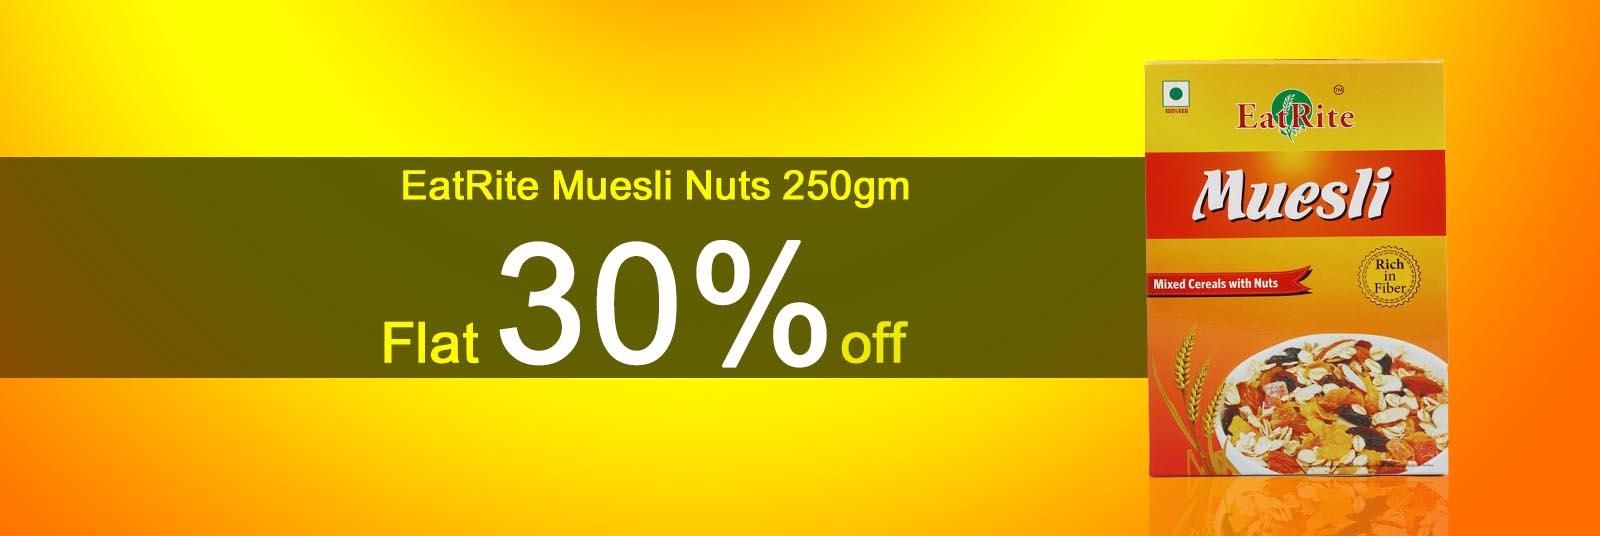 Muesli Nuts